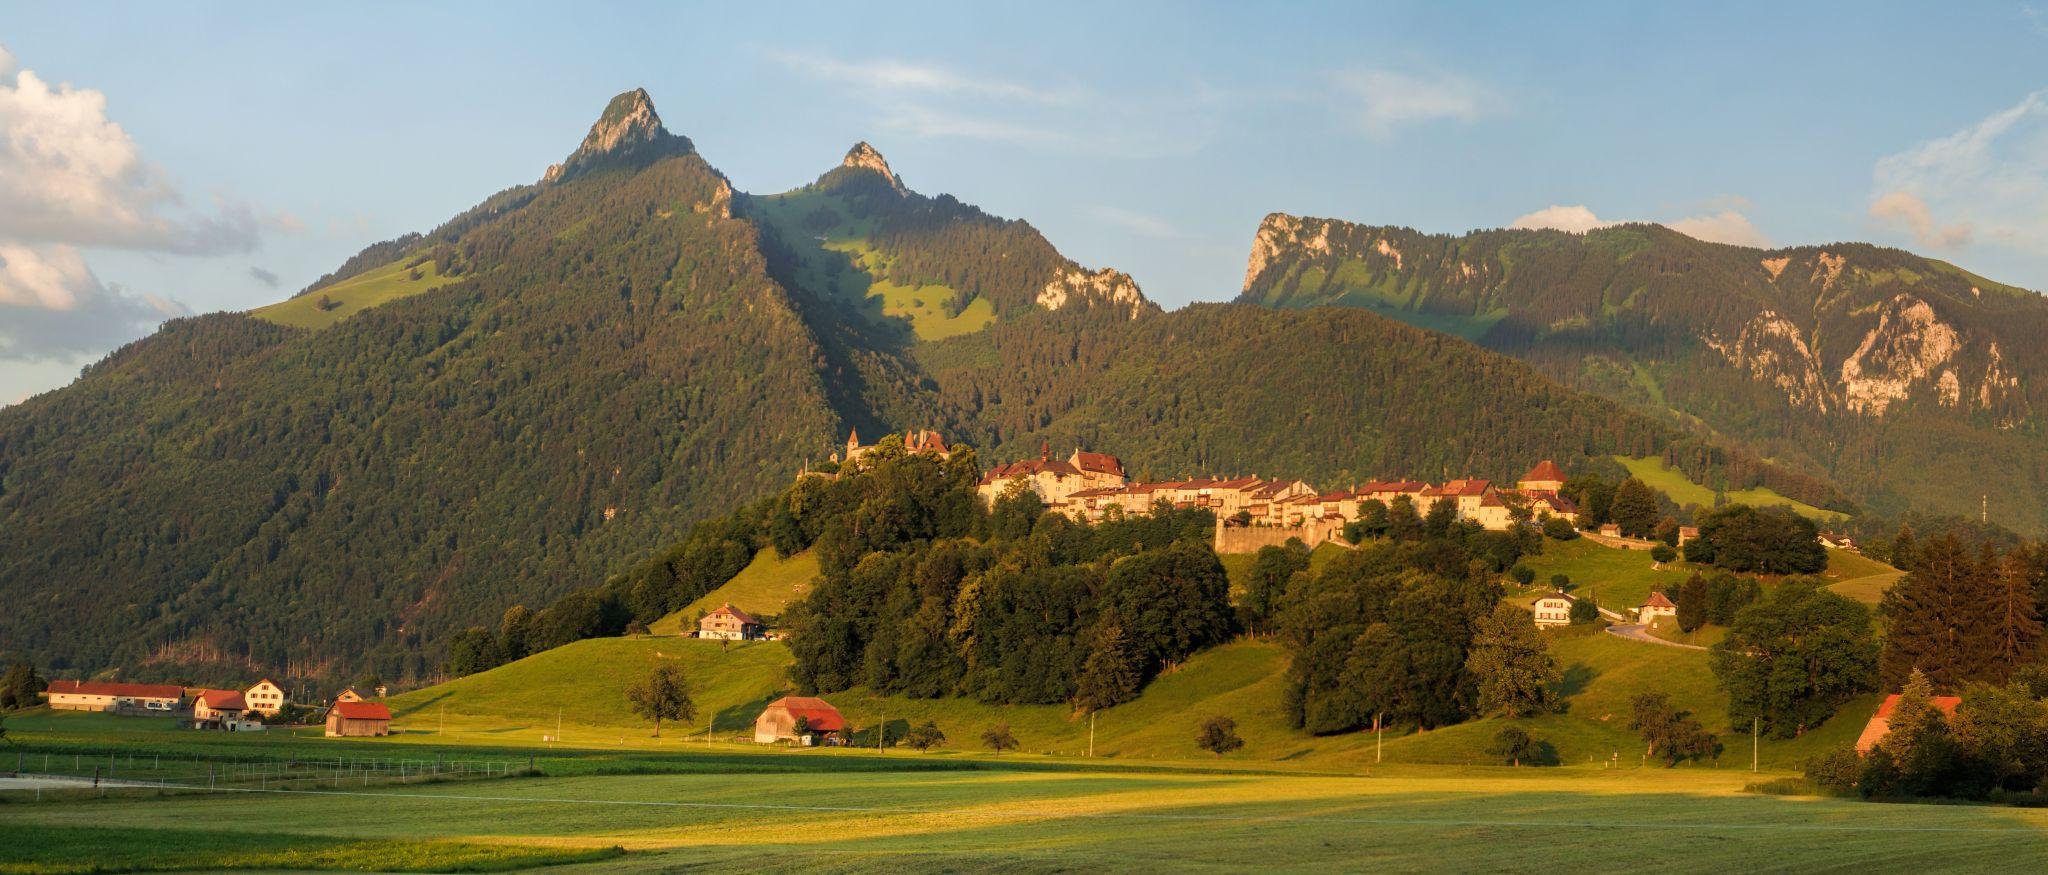 Gruyères from Route du Paquier, Switzerland